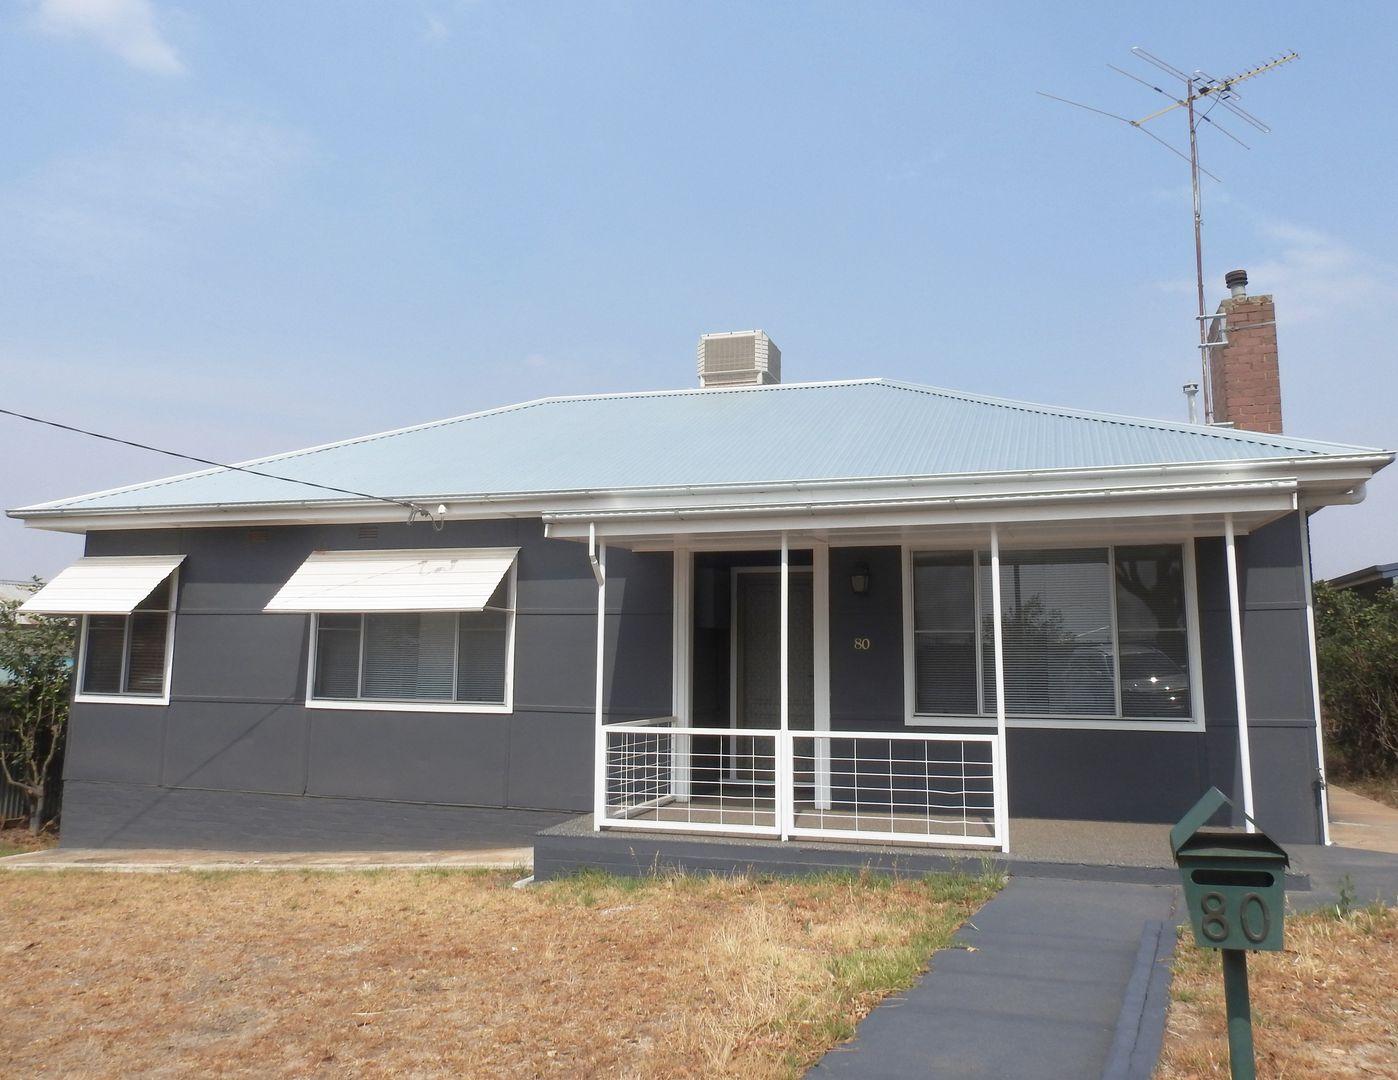 80 LUCAN STREET, Harden NSW 2587, Image 0